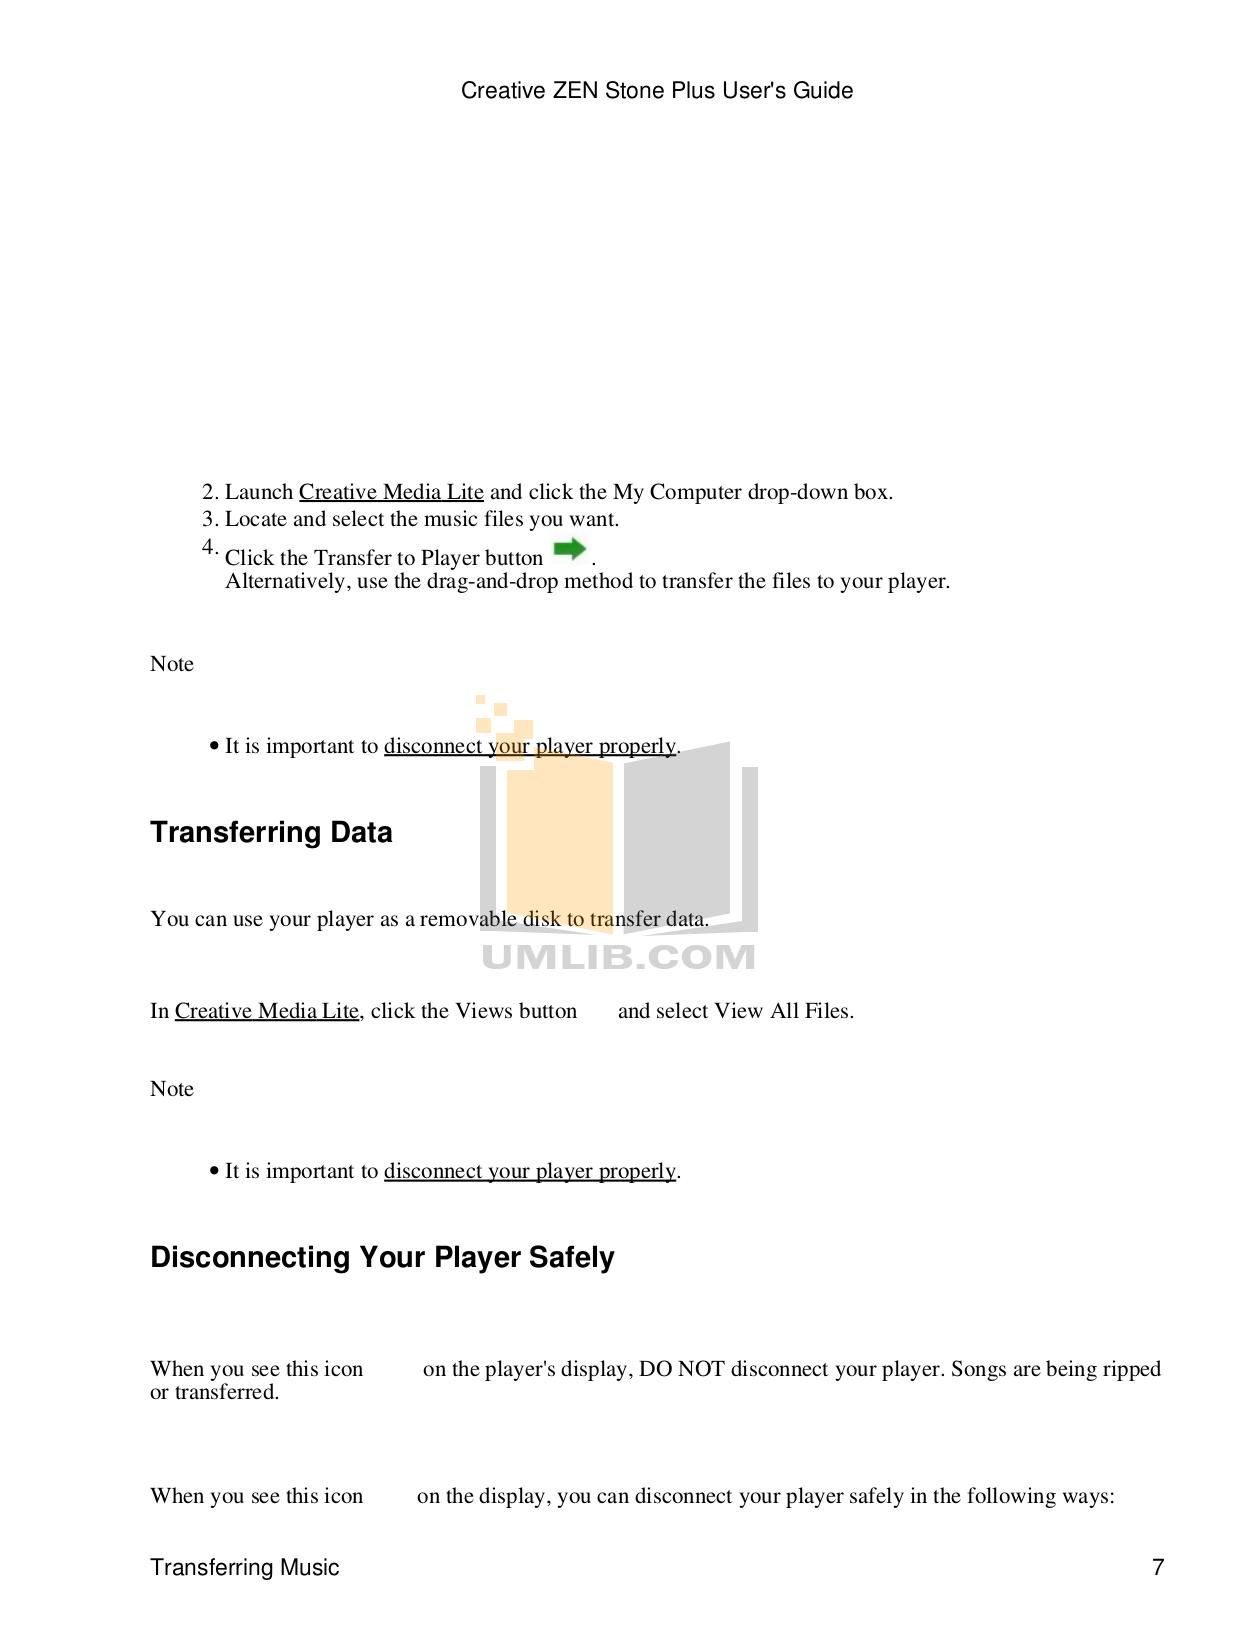 zen stone manual daily instruction manual guides u2022 rh testingwordpress co zen stone mp3 player manual troubleshooting creative zen stone plus mp3 player manual